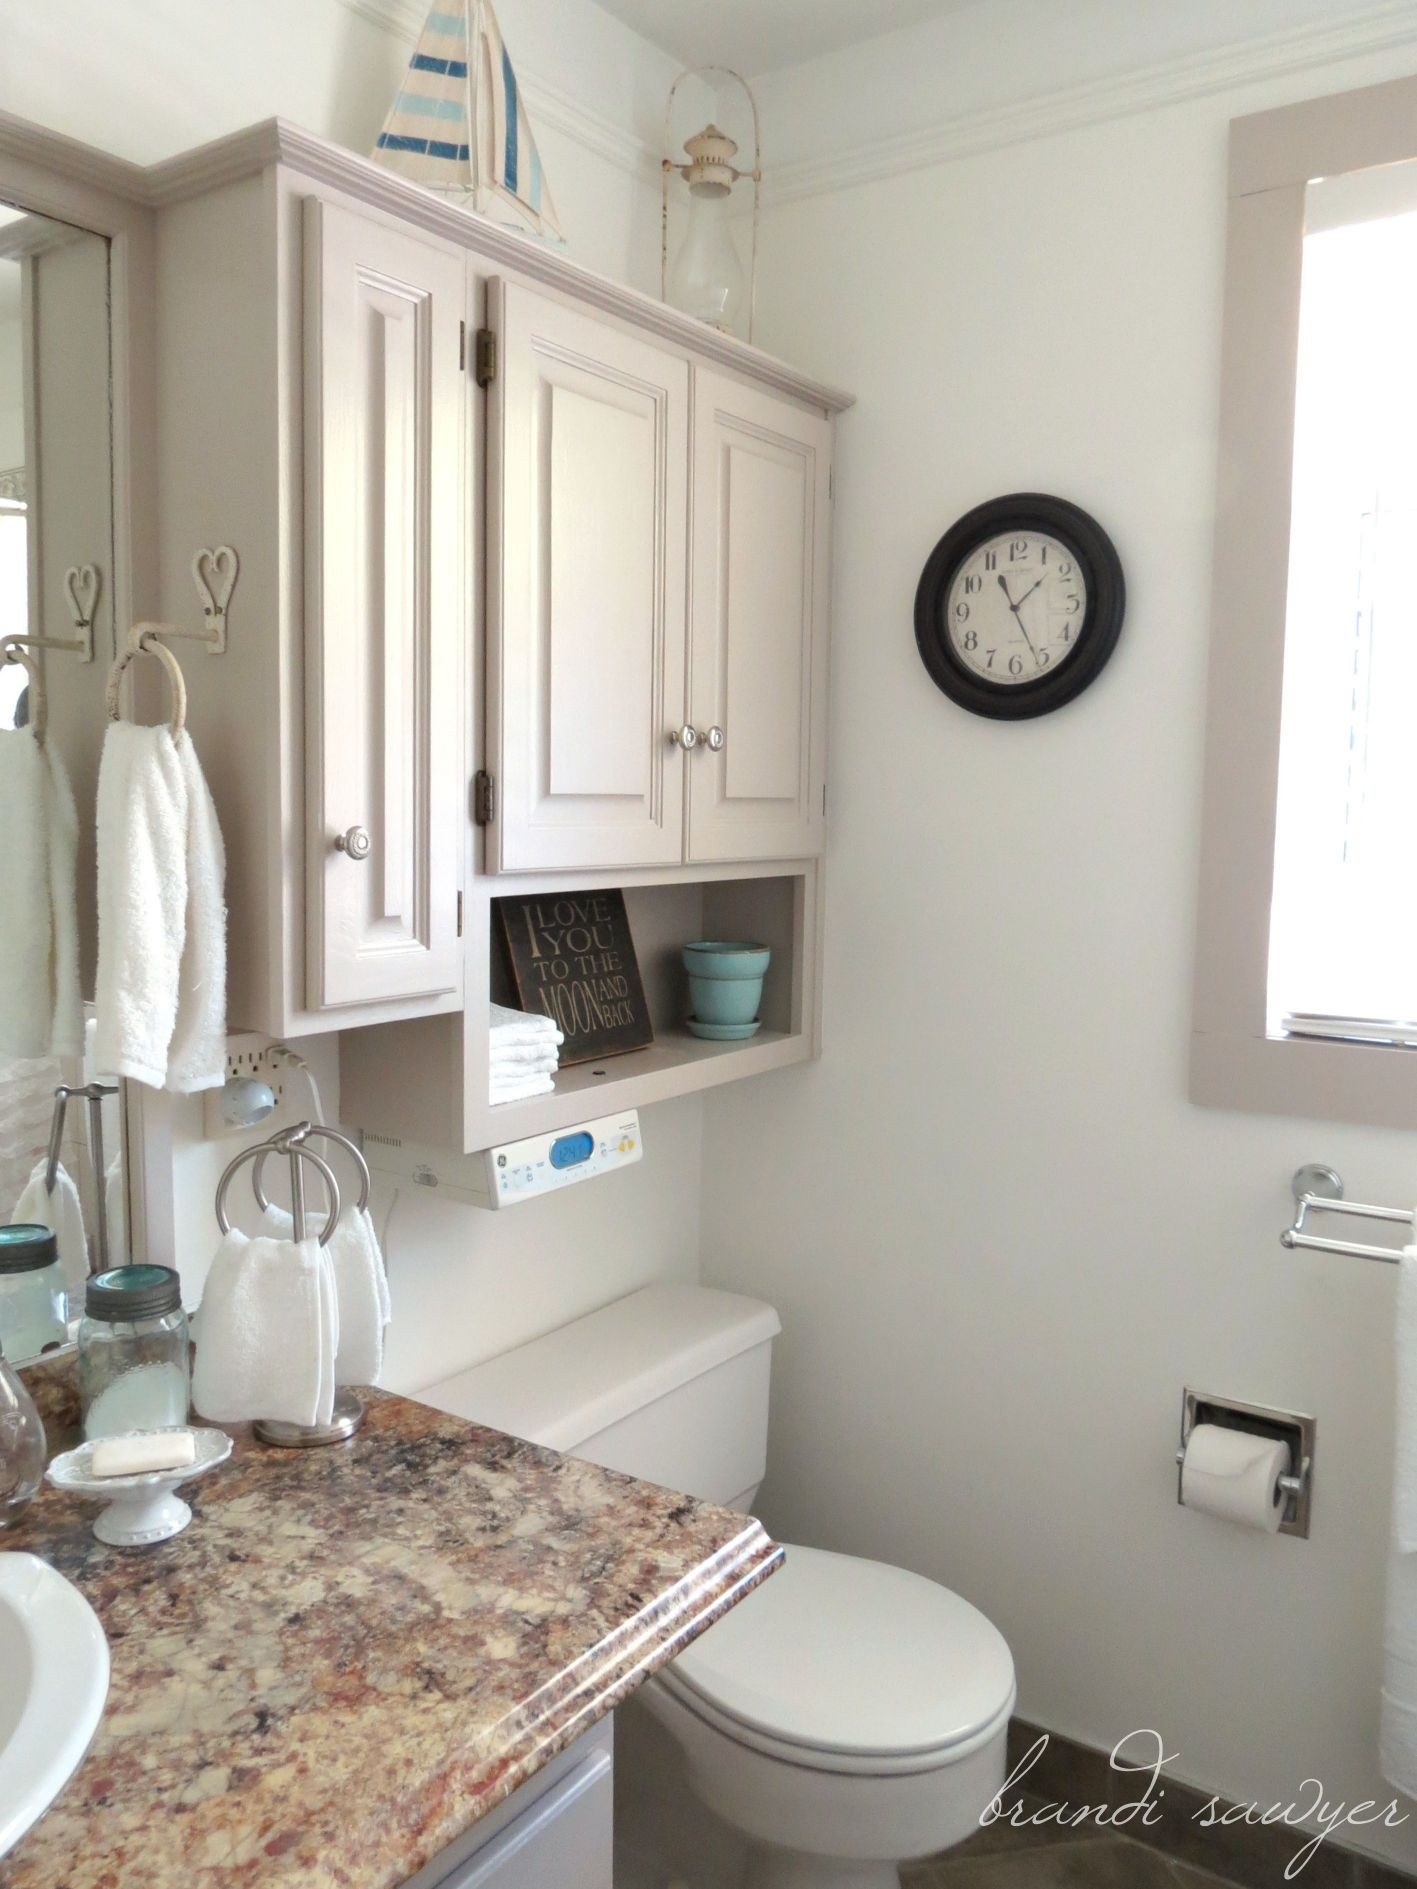 Cute Small Bathroom Makeover Model - Home Sweet Home ... on Bathroom Model  id=44565